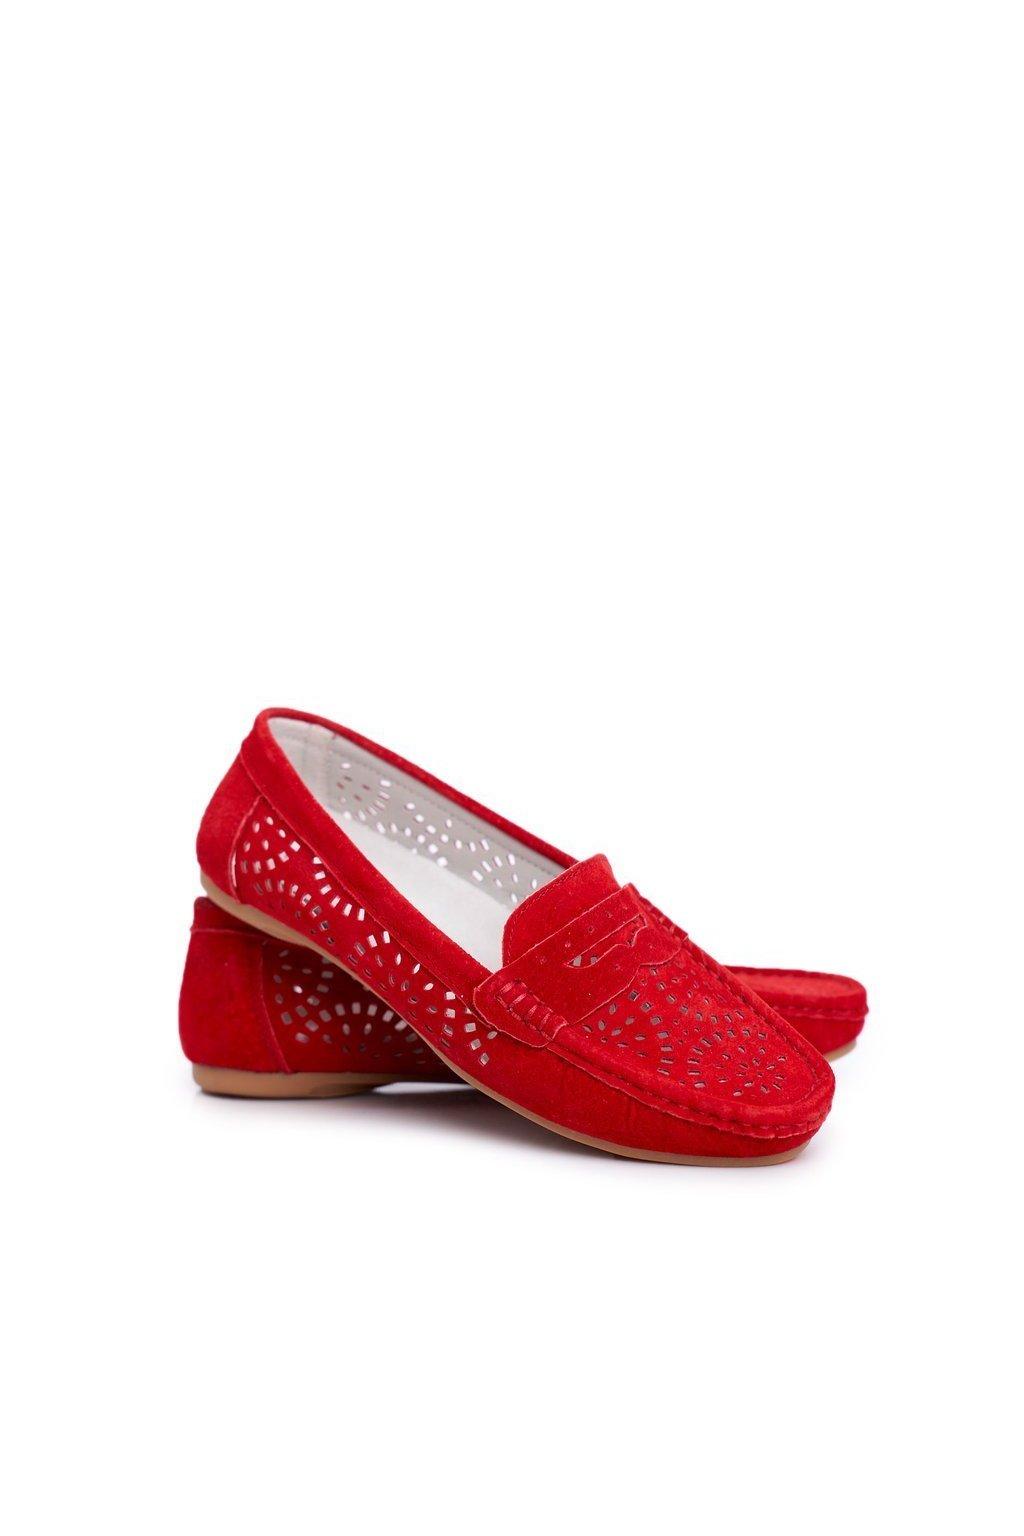 Dámske mokasíny farba červená NJSK LR92309 RED